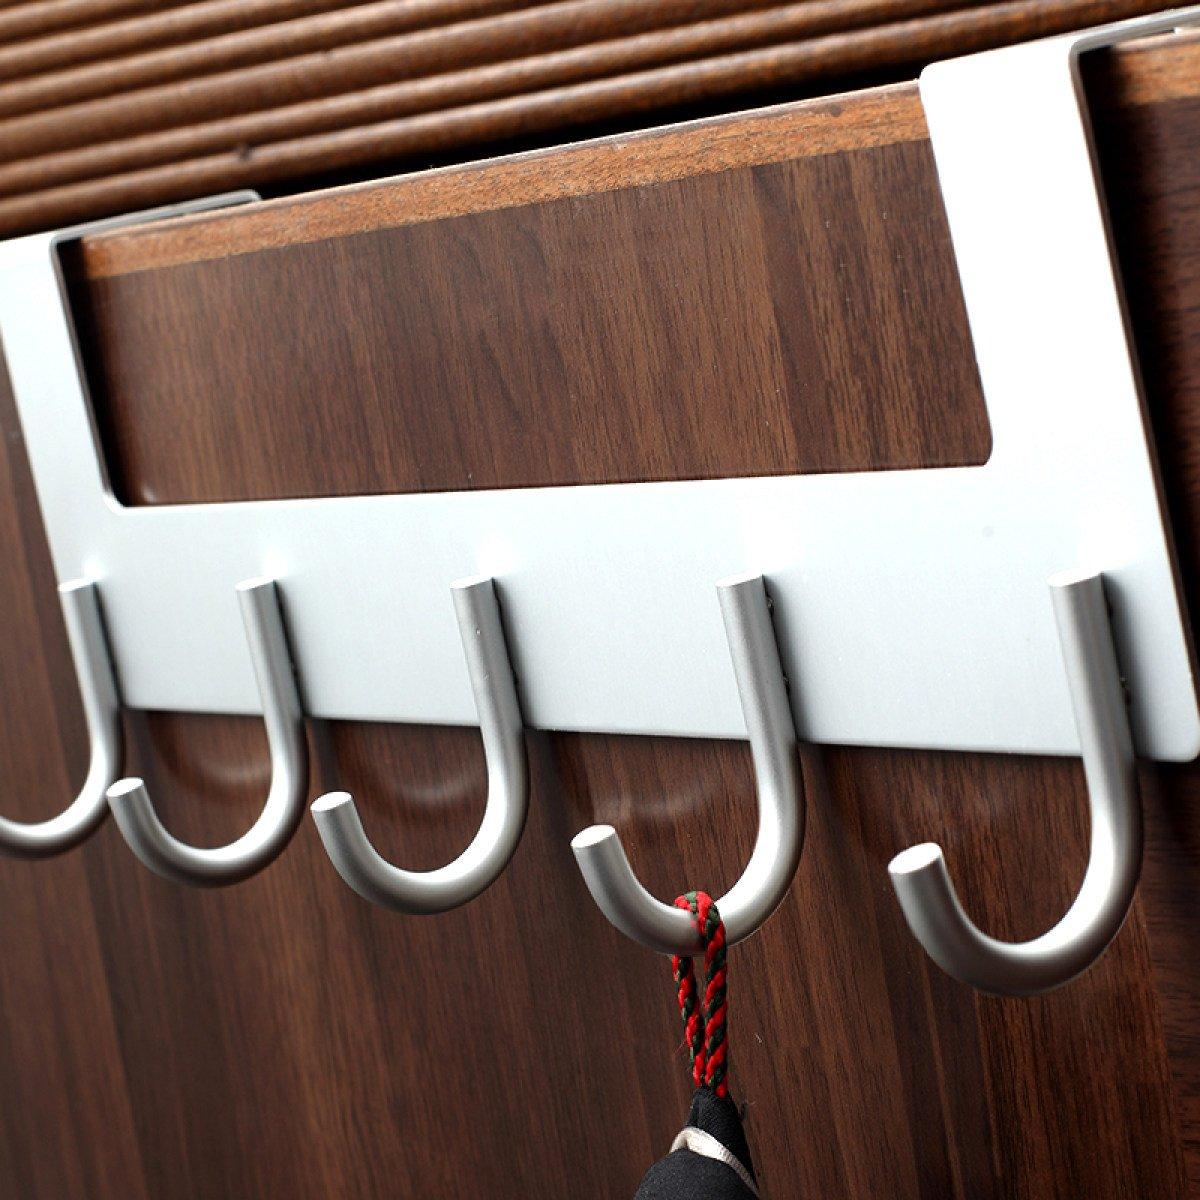 LIAN Coat hook door hook space aluminum traceless creative nail-free racks row hook (Color : Silver A)